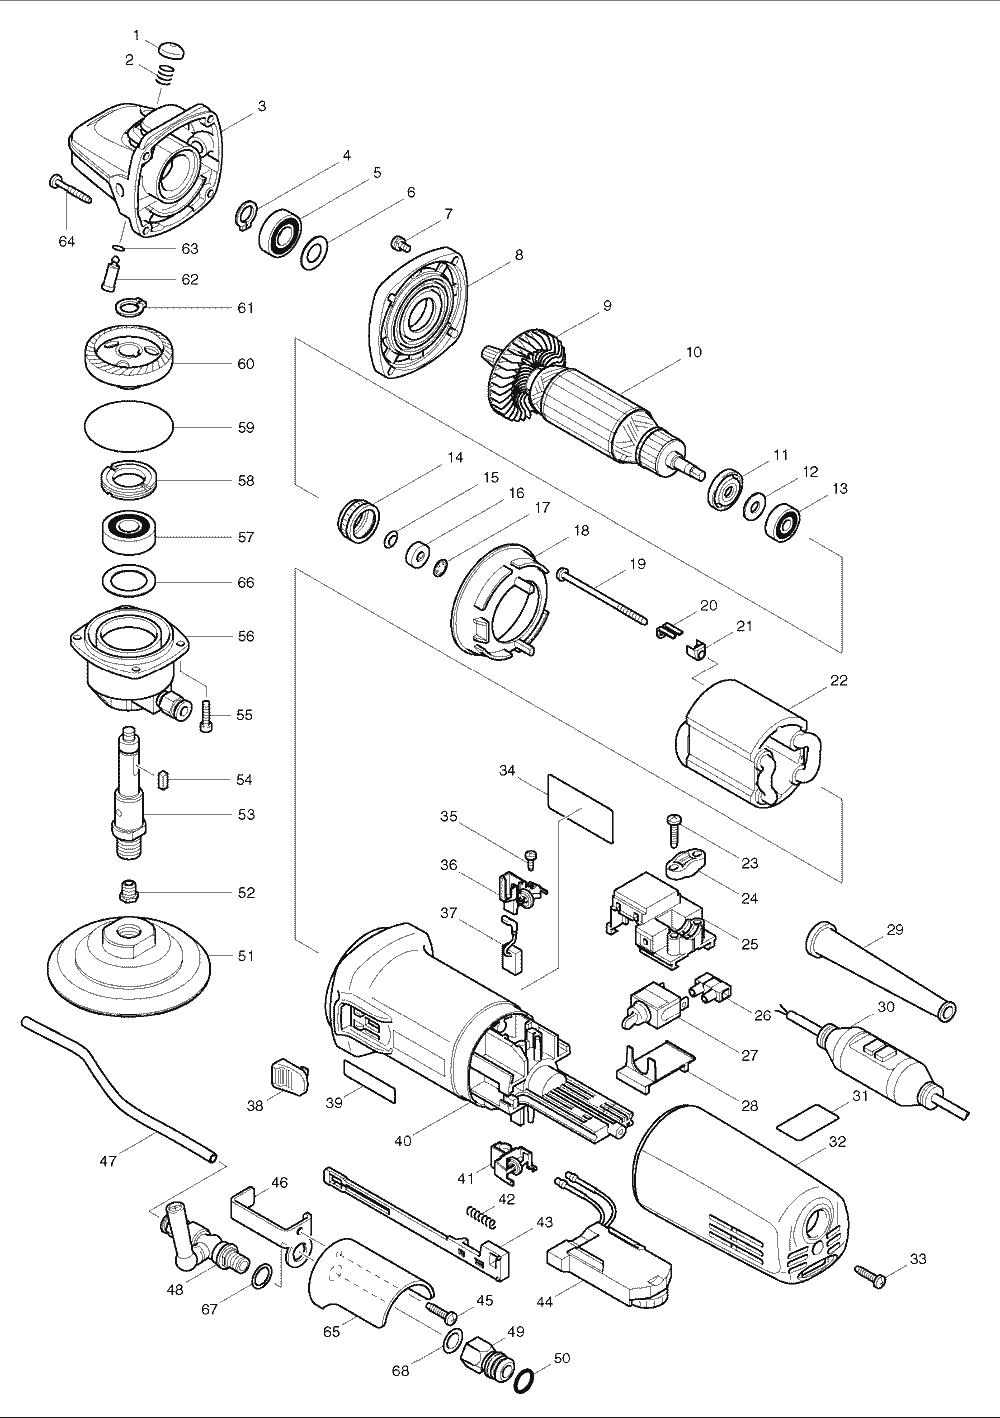 Makita Polisher Cord Wiring Diagram on